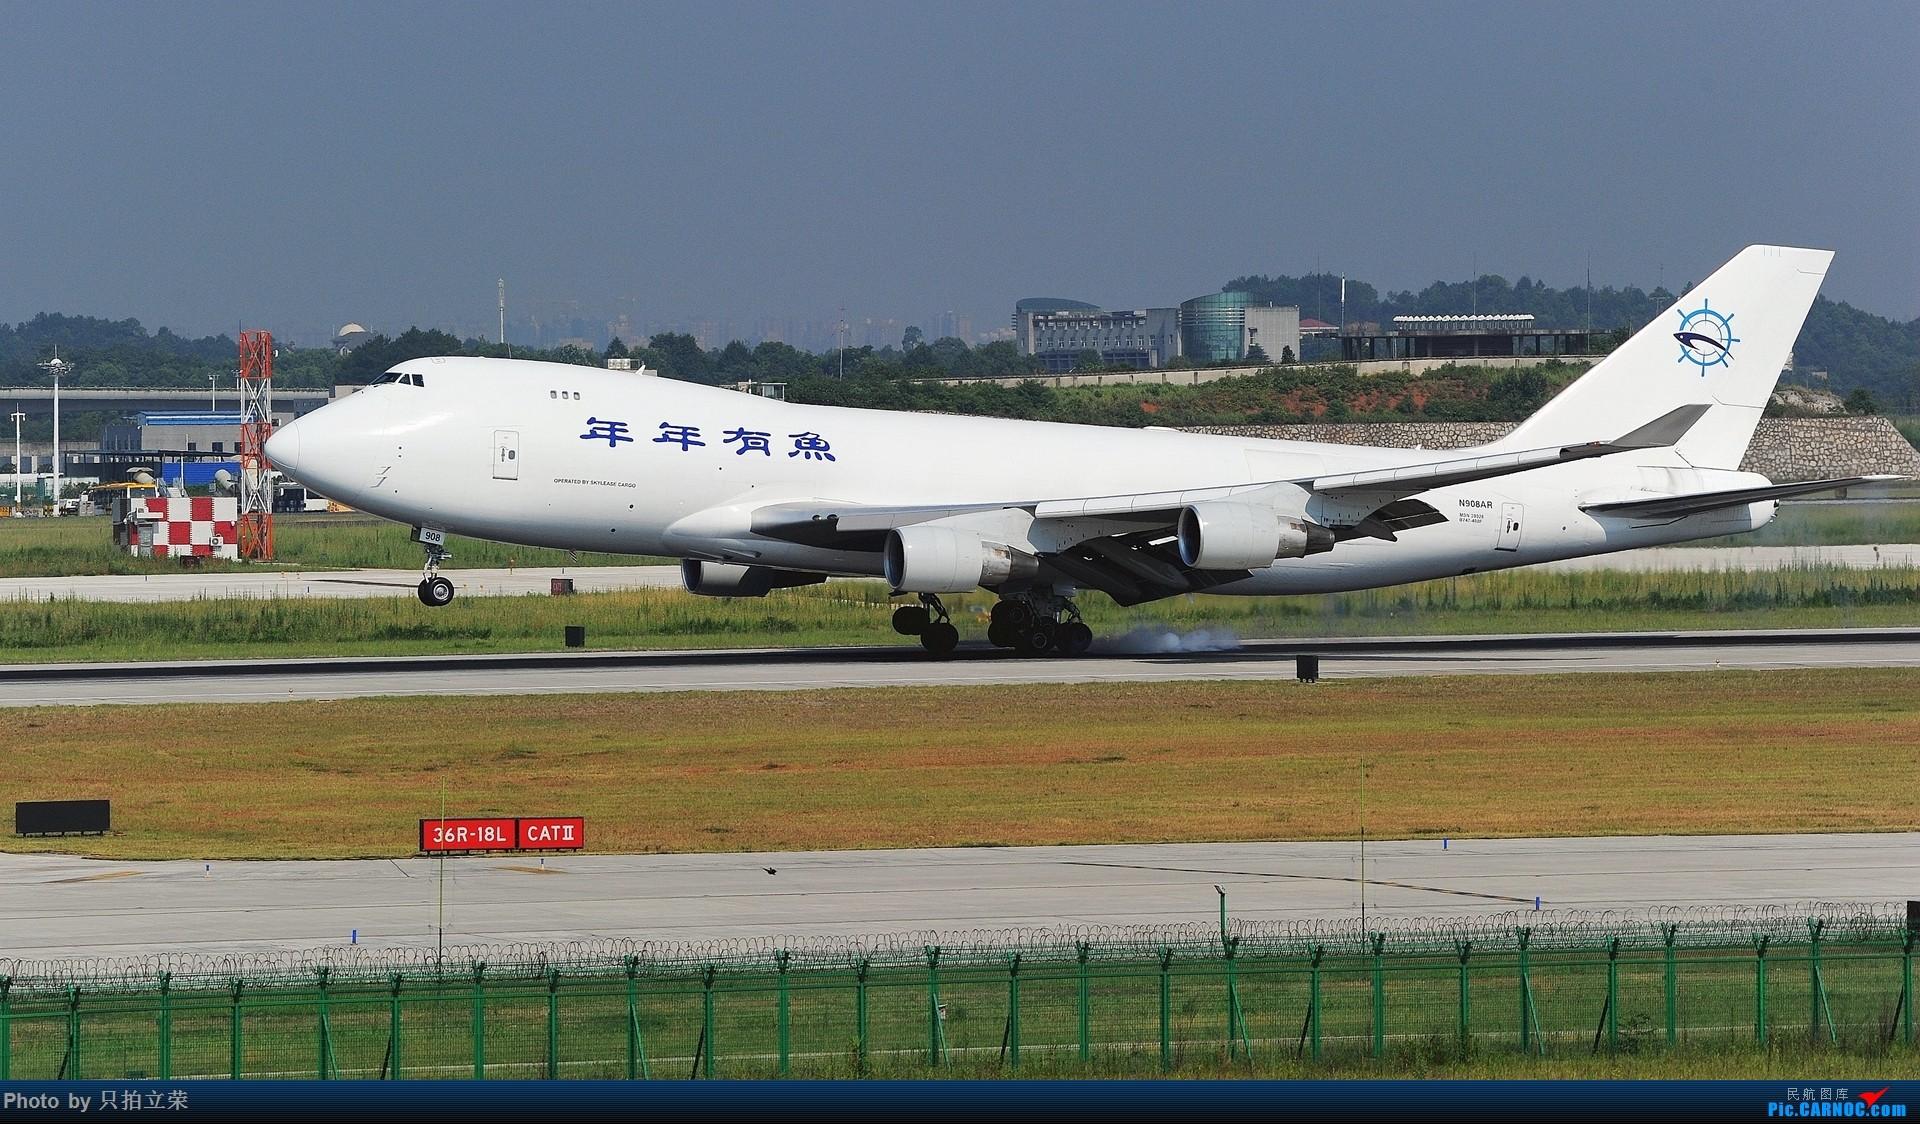 Re:[原创]湖南飞友会:湖南首条洲际货运定期航线降落全景纪实,波音744F BOEING 747-400F N908AR 中国长沙黄花国际机场